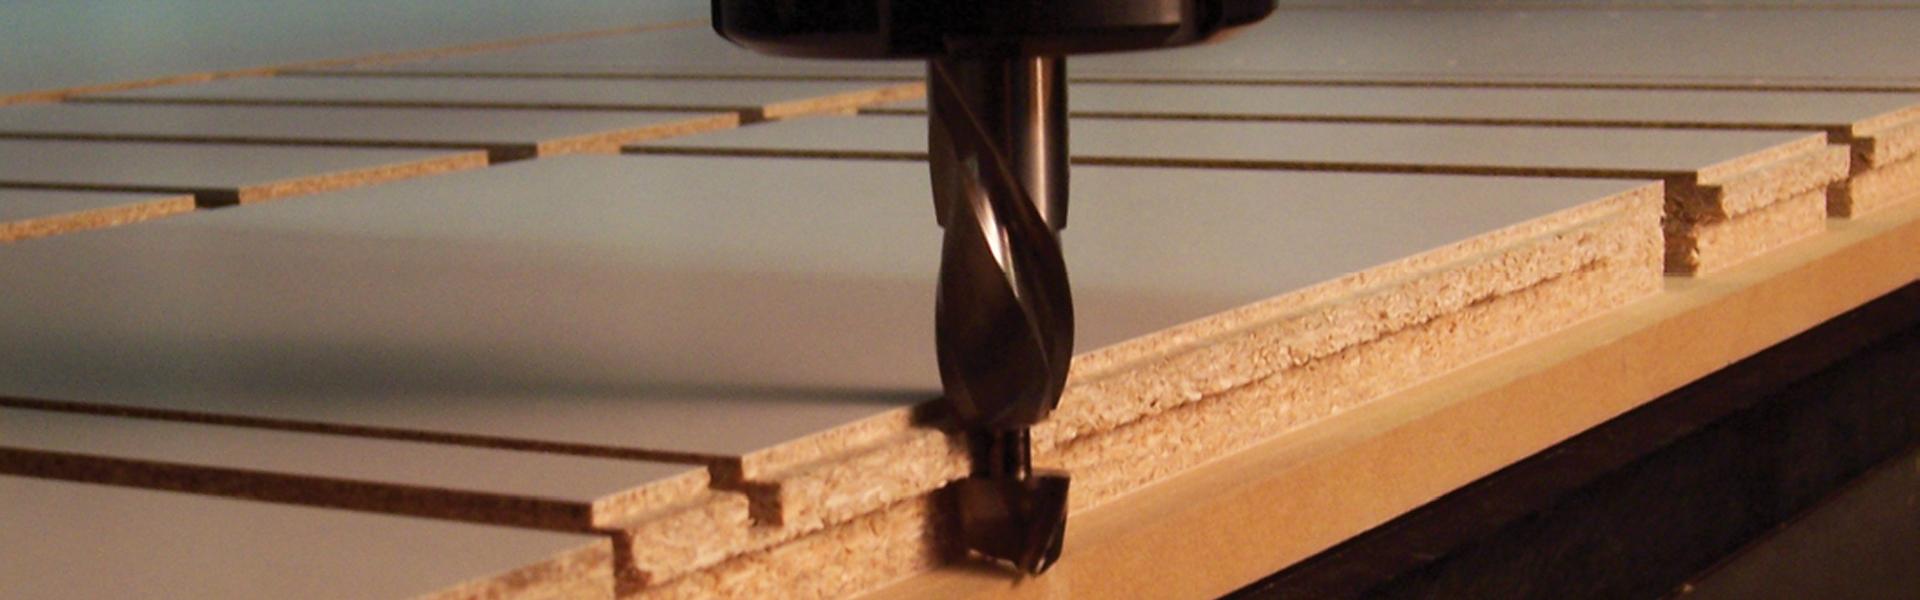 Cabinet Manufacturing Methods